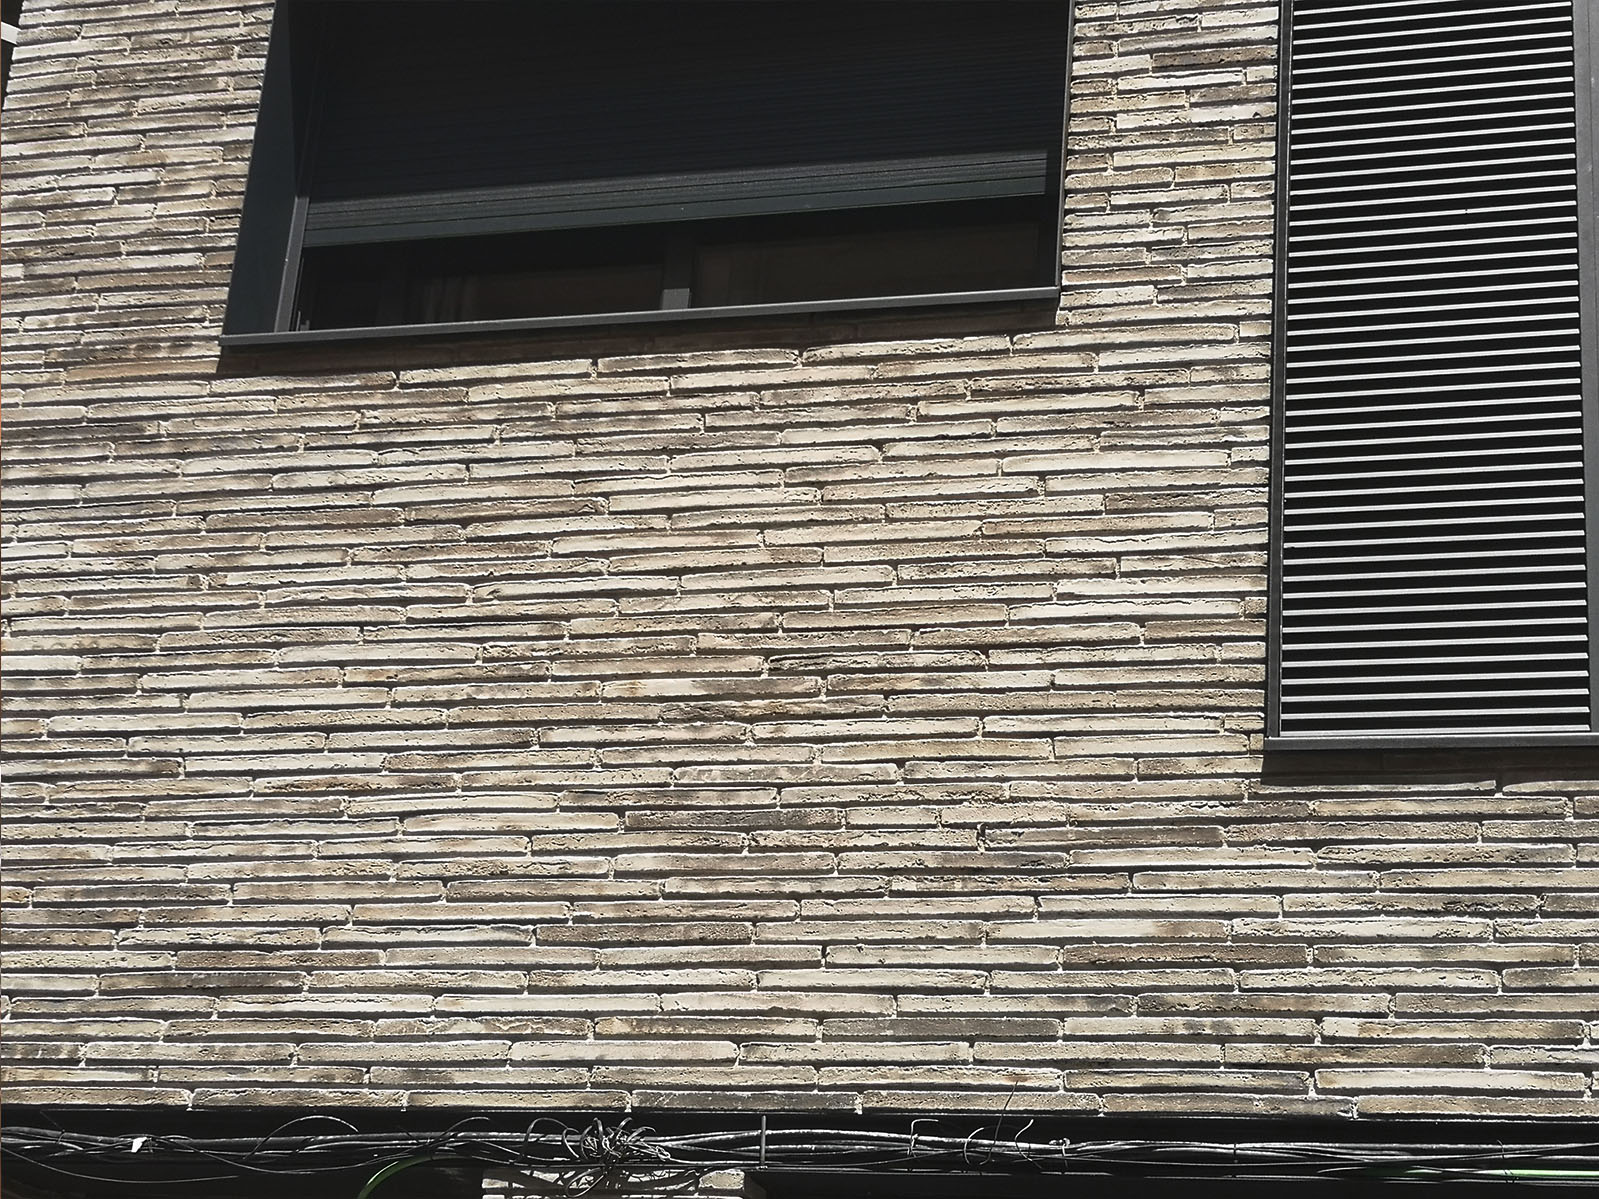 Ladrillos Superlargo Manual Gris Destonado